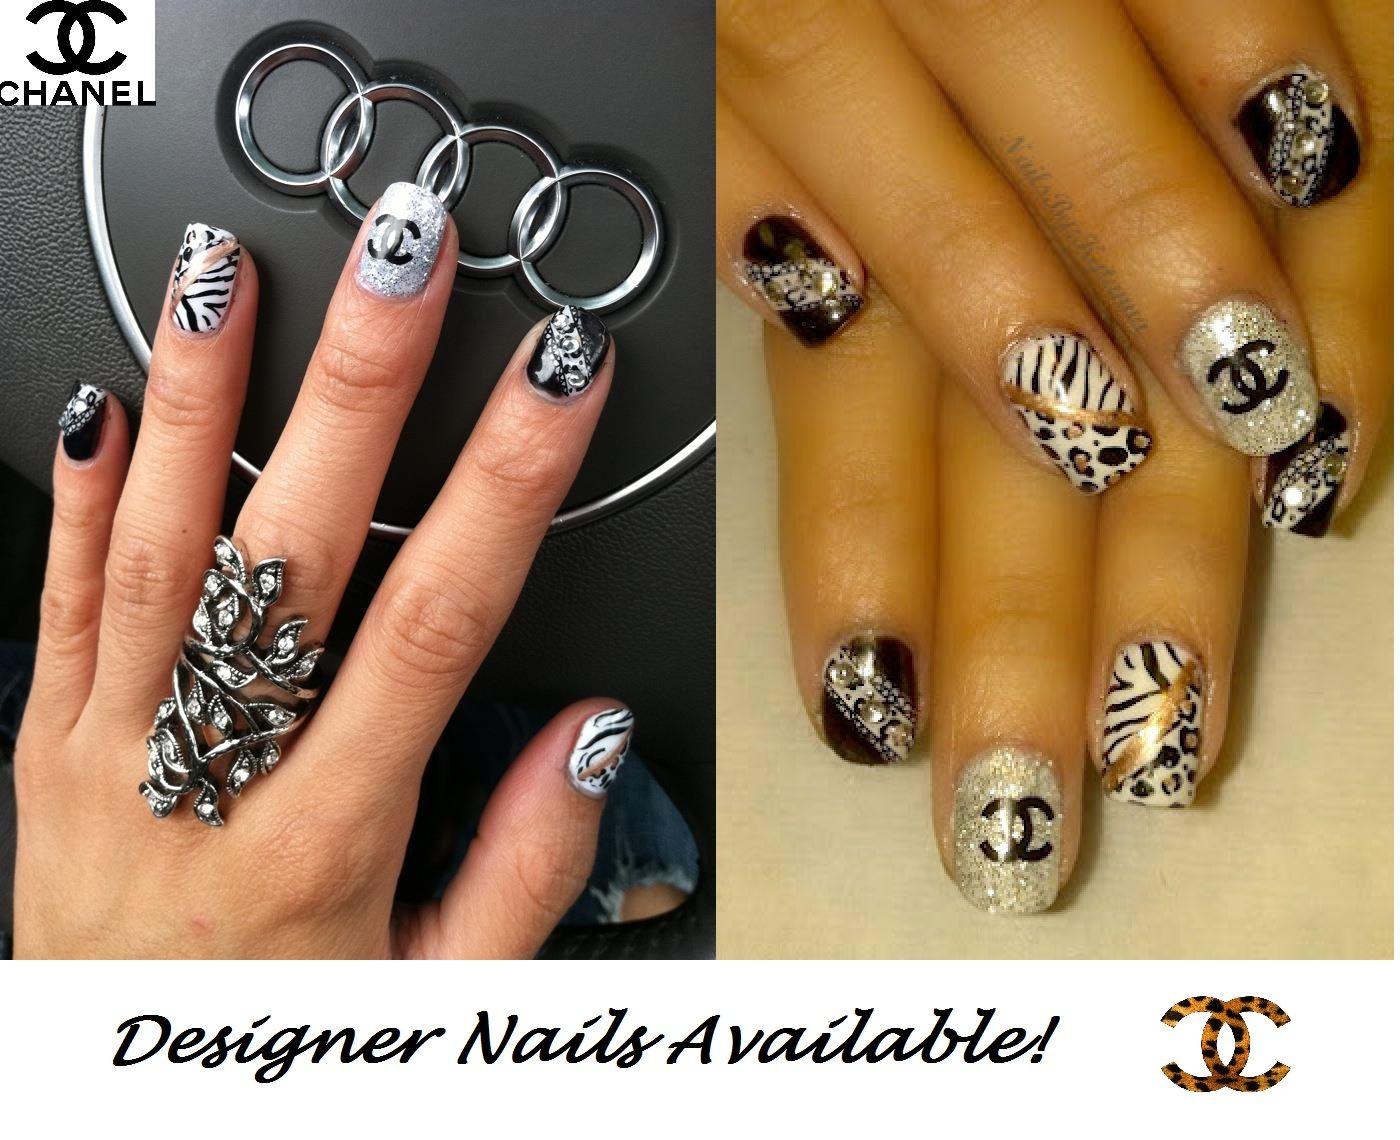 Designer nails | Beauty/Fitness Junkie | Pinterest